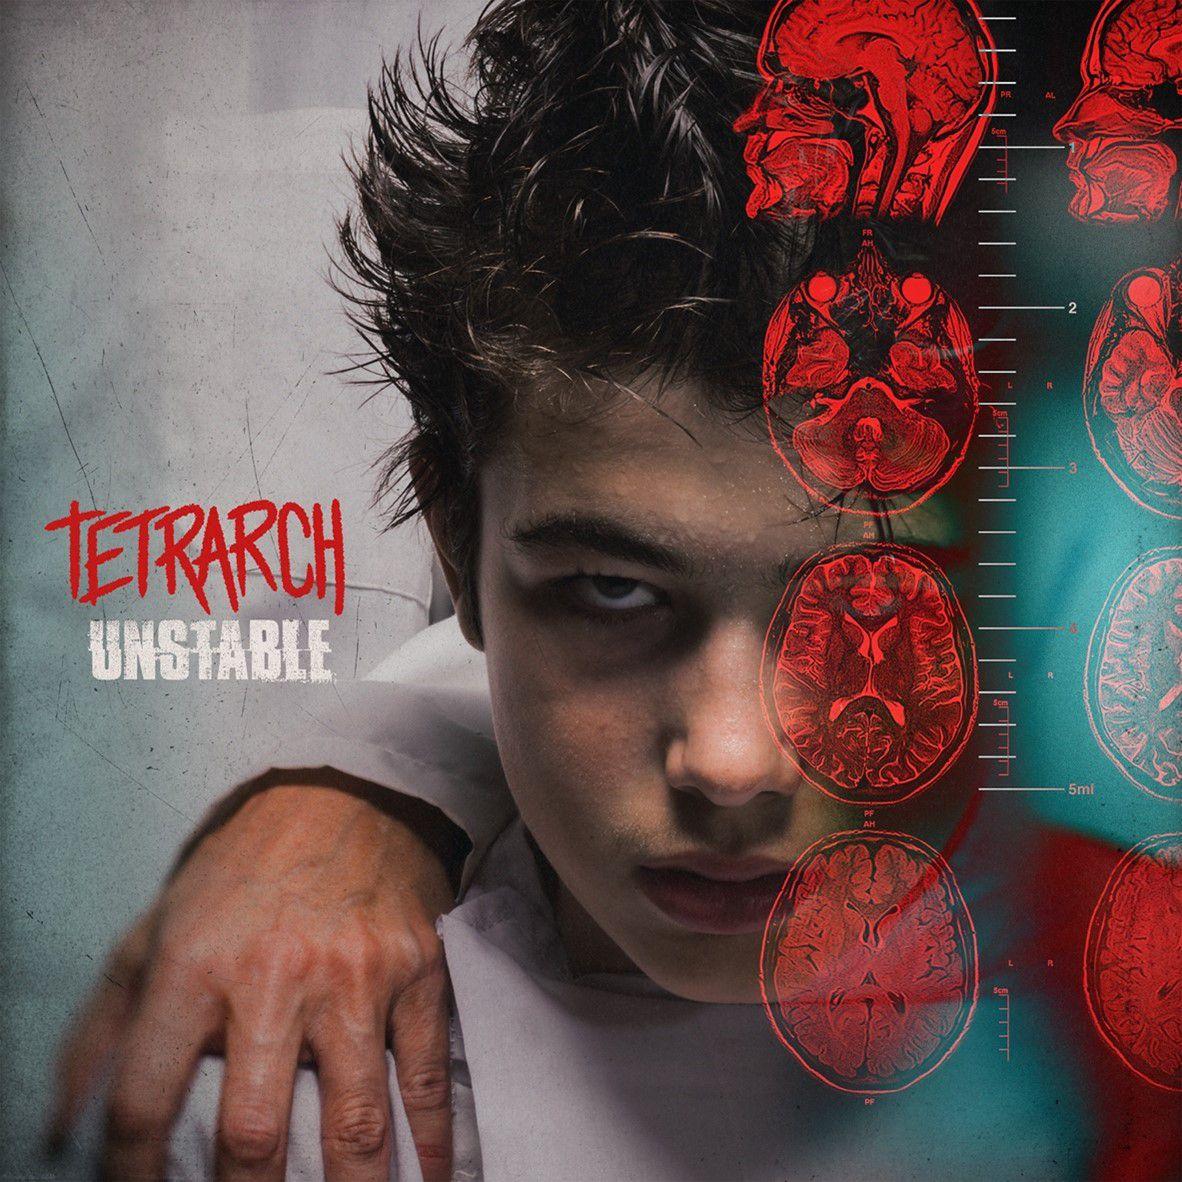 Tetrarch Unstable artwork